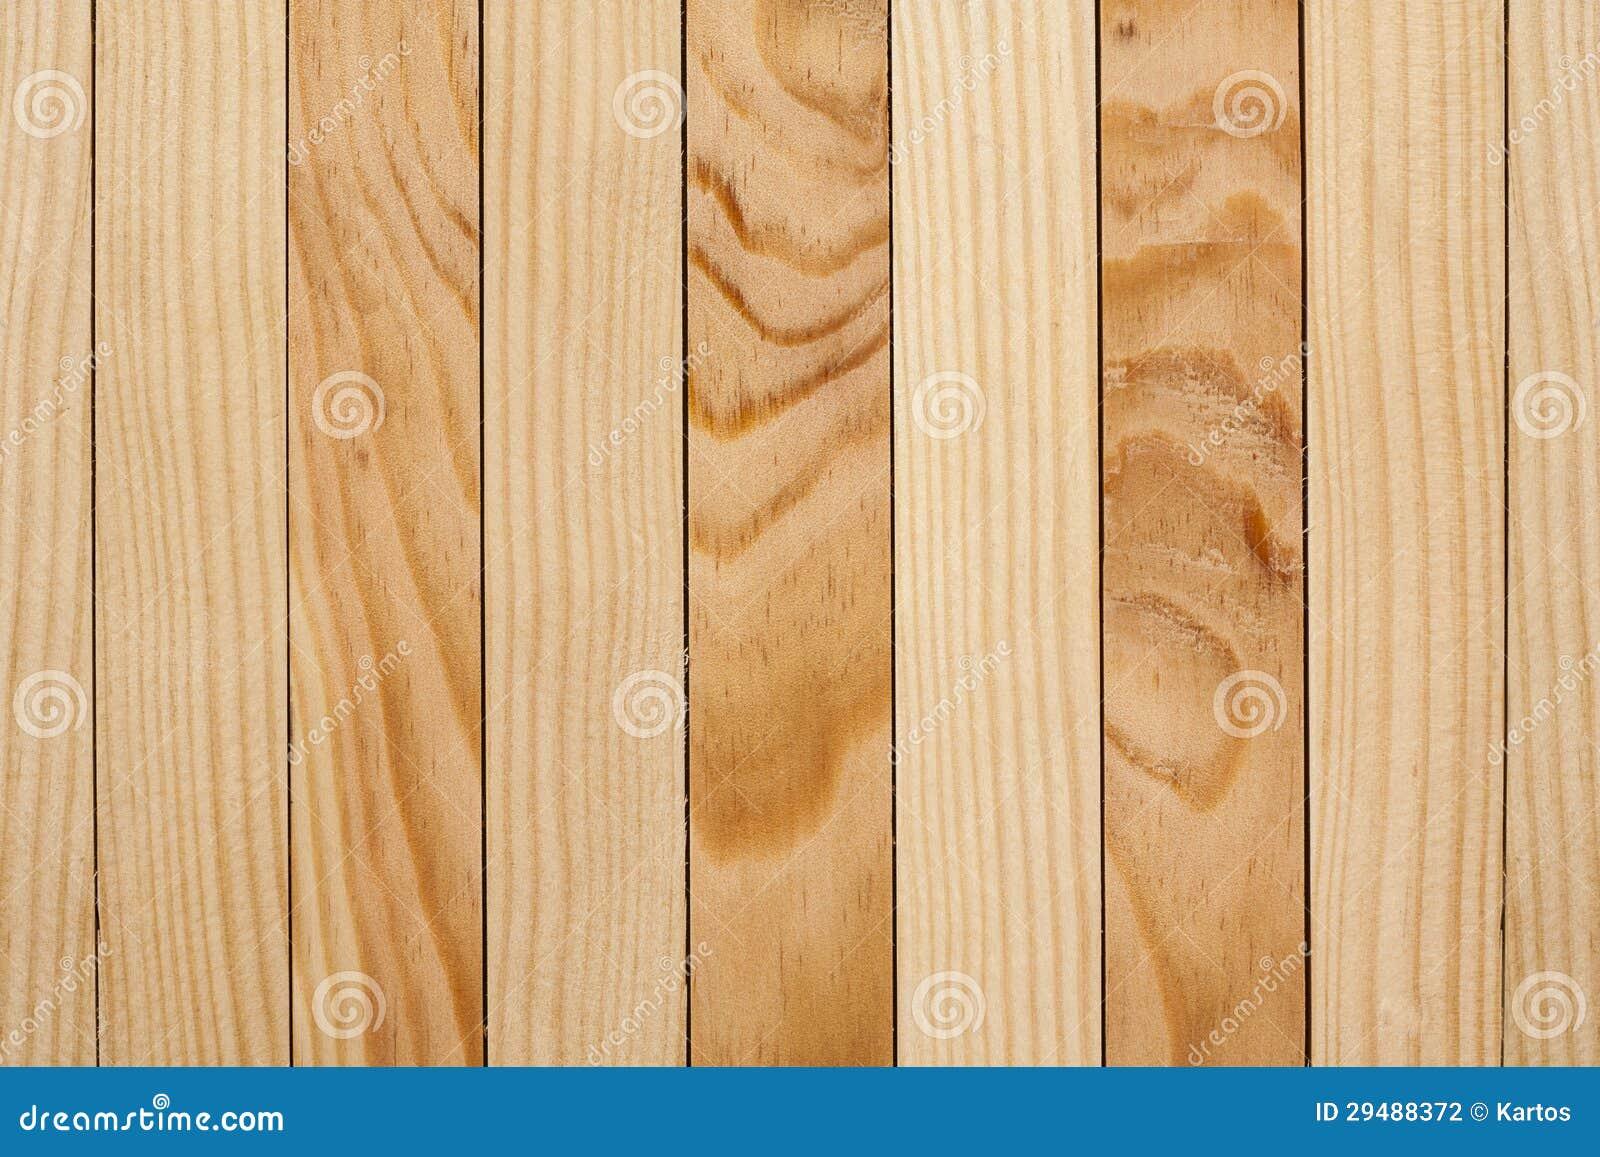 Textura de madera de pino fotograf a de archivo imagen - Tratamiento para madera de pino ...